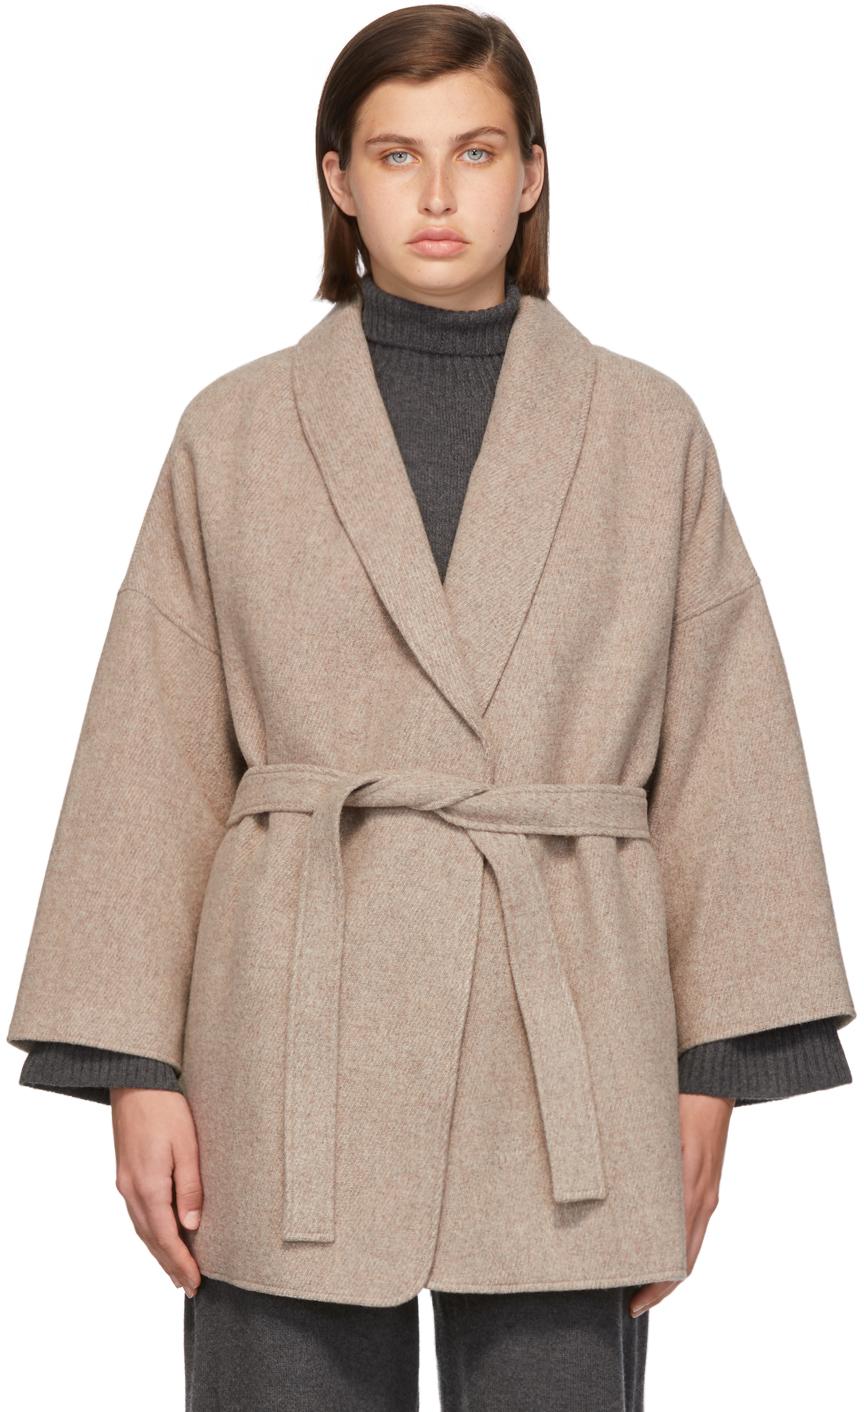 Taupe Wool Sol Robe Jacket